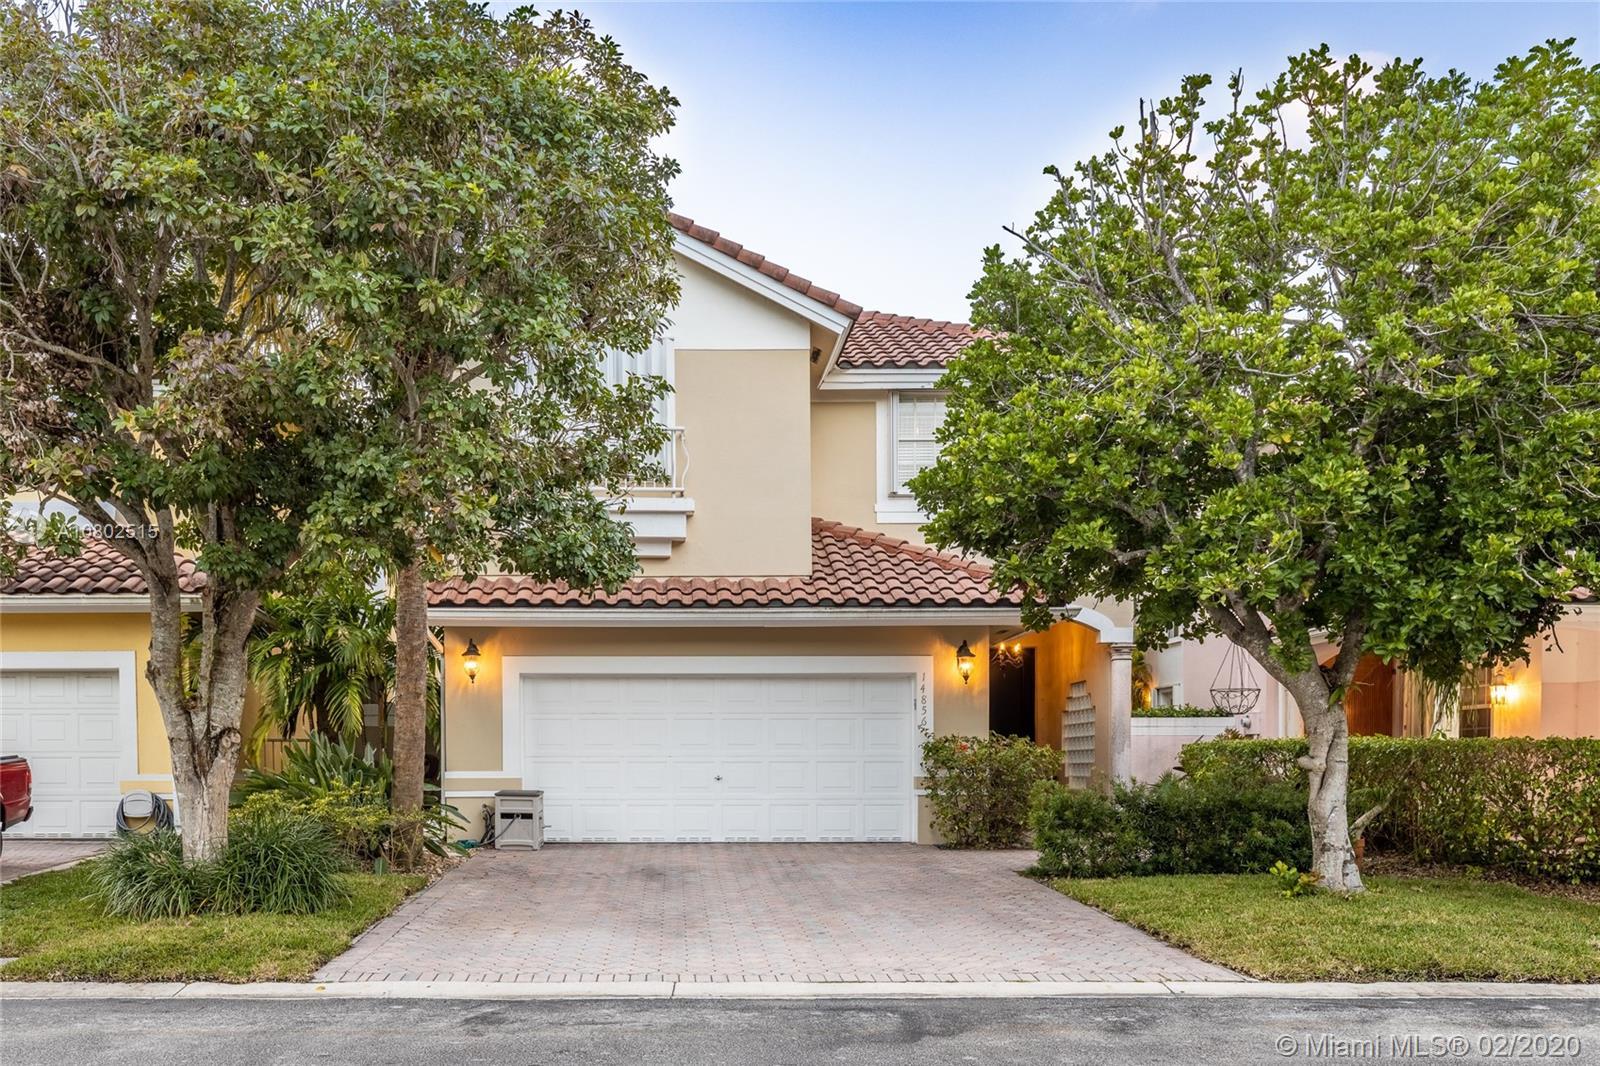 14856 SW 132nd Ave, Miami, FL 33186